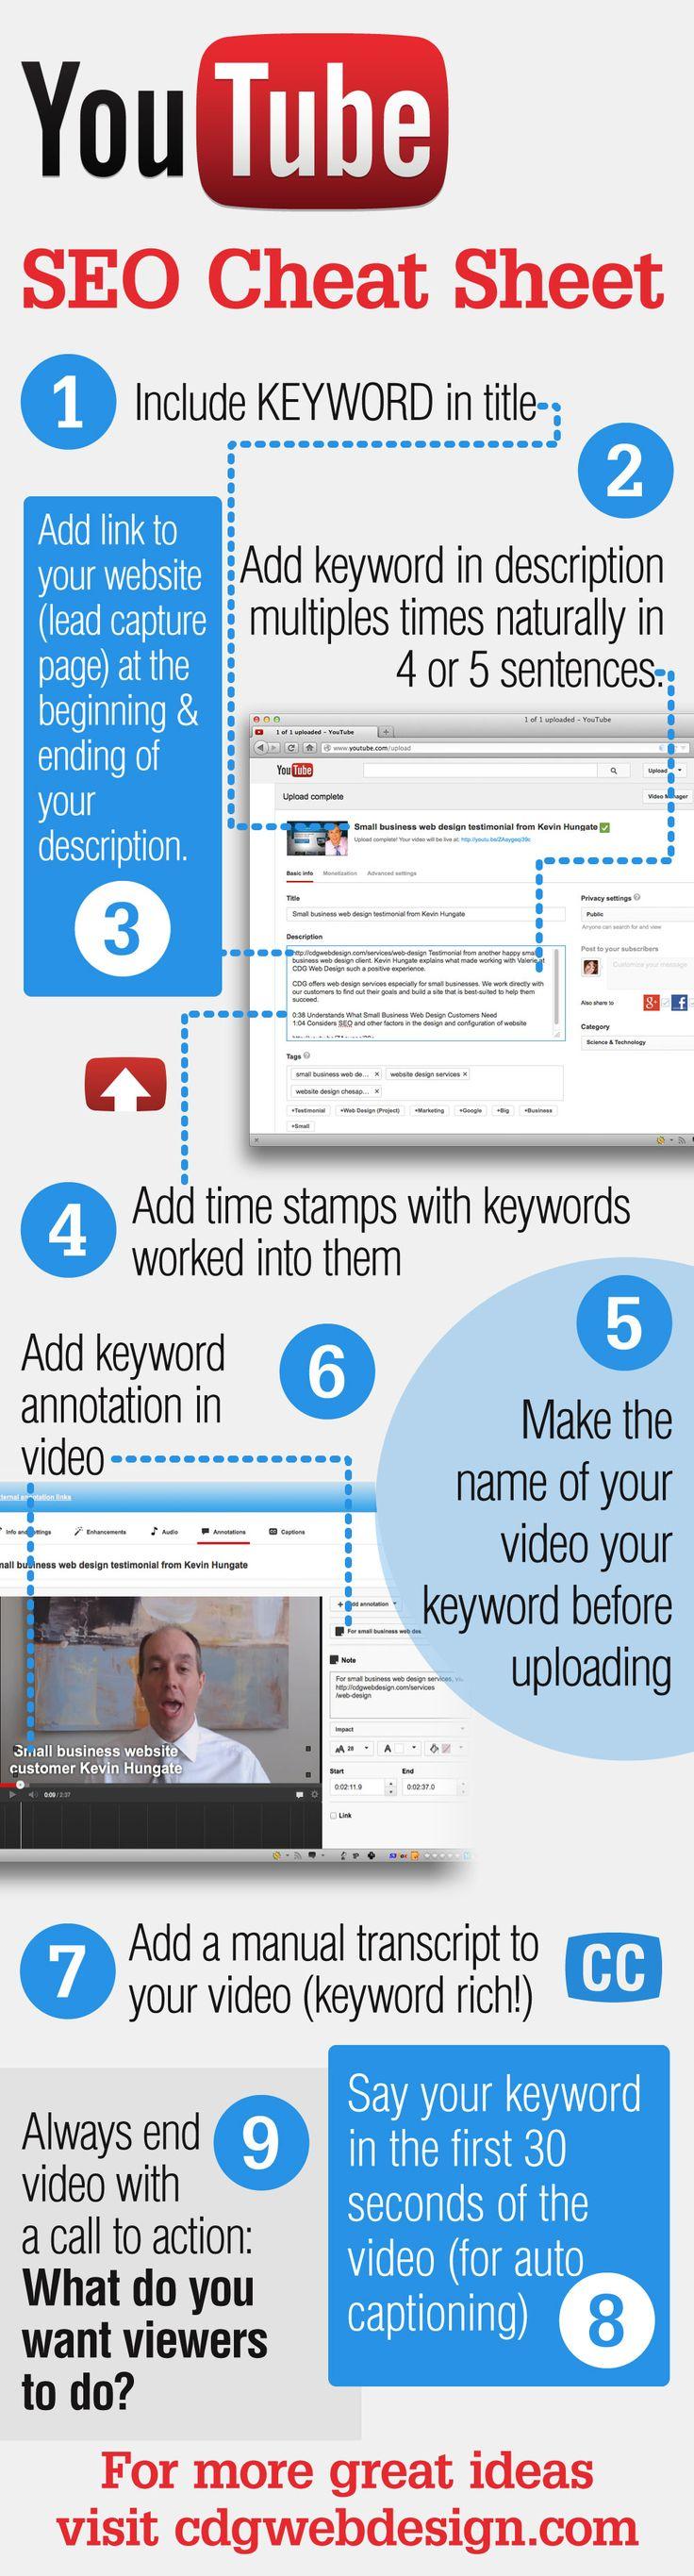 youtube cheat sheet infographic